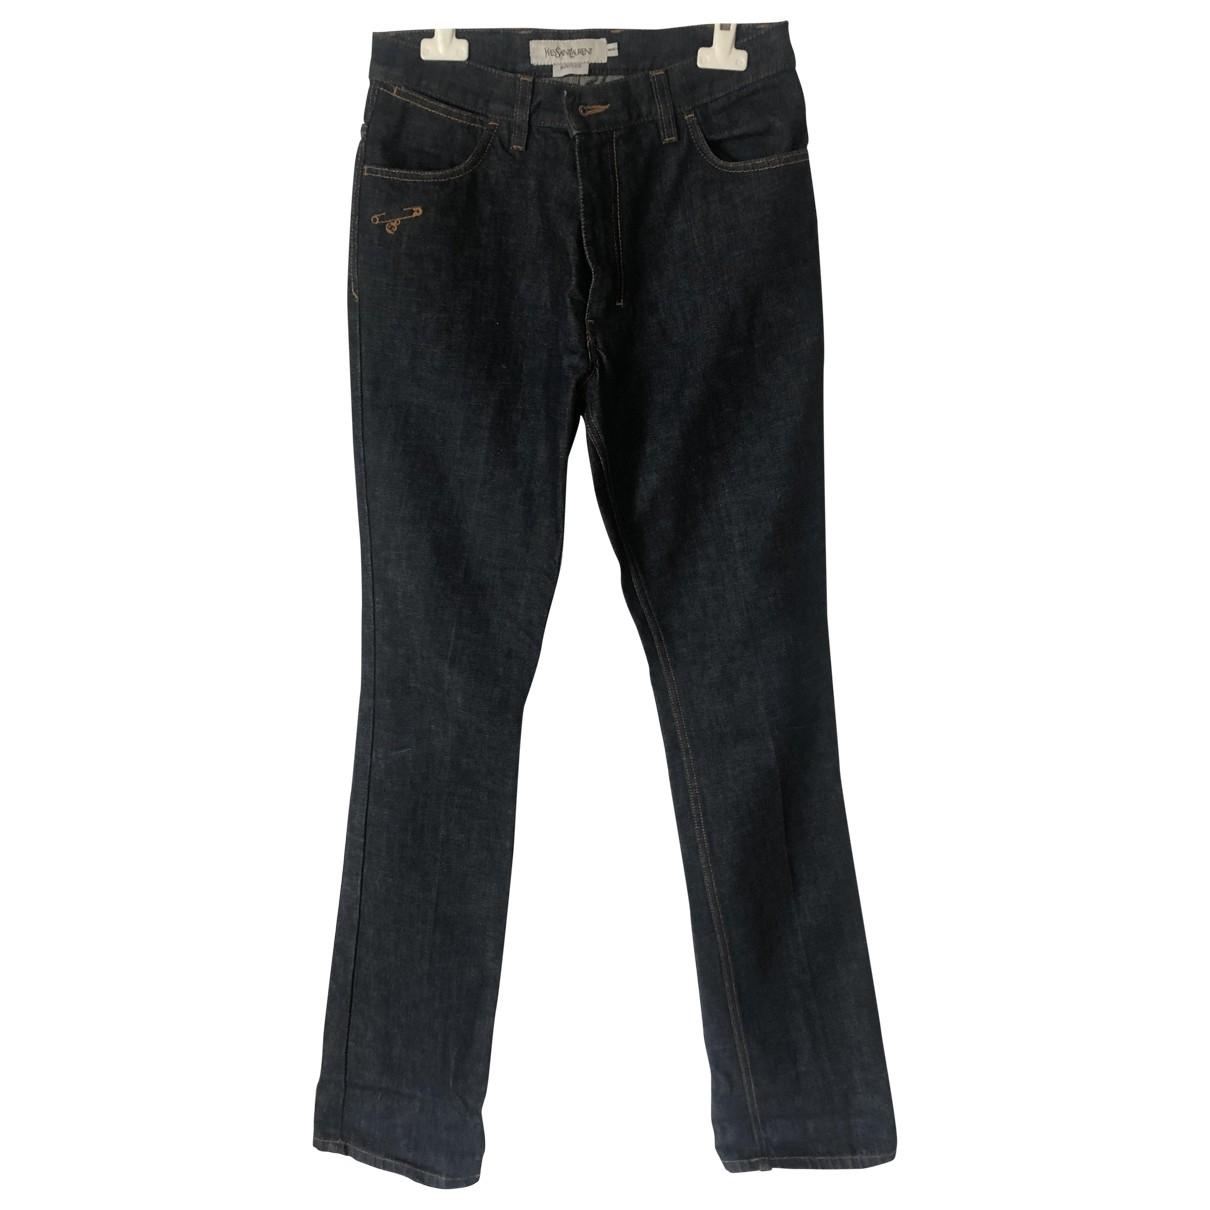 Yves Saint Laurent \N Blue Cotton Jeans for Men 44 FR